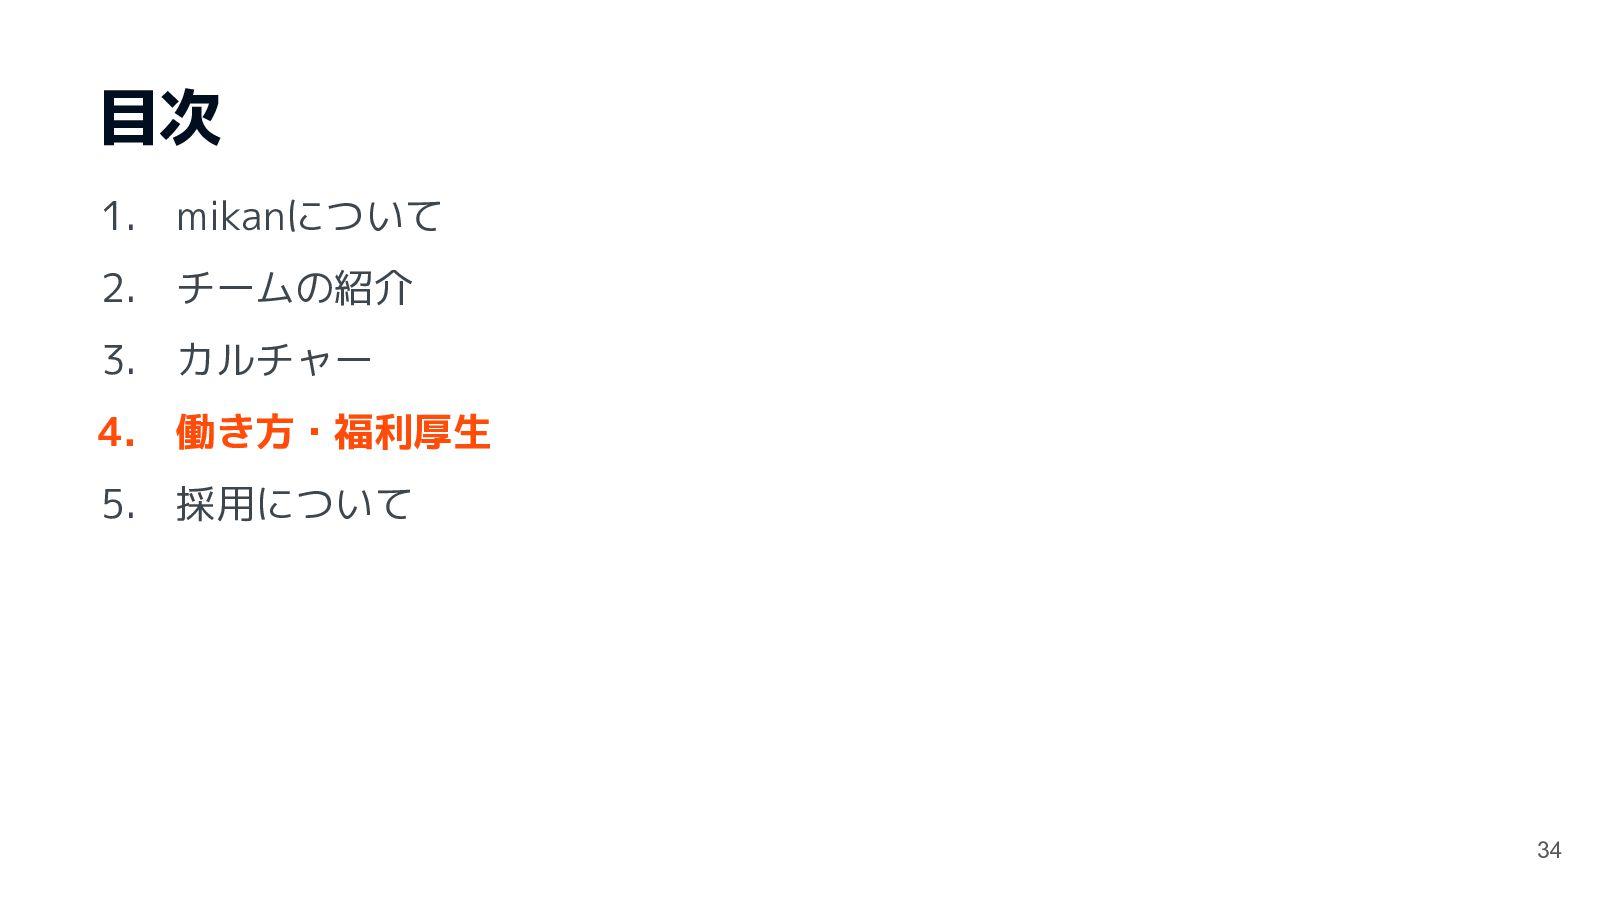 mikanの働き方 33